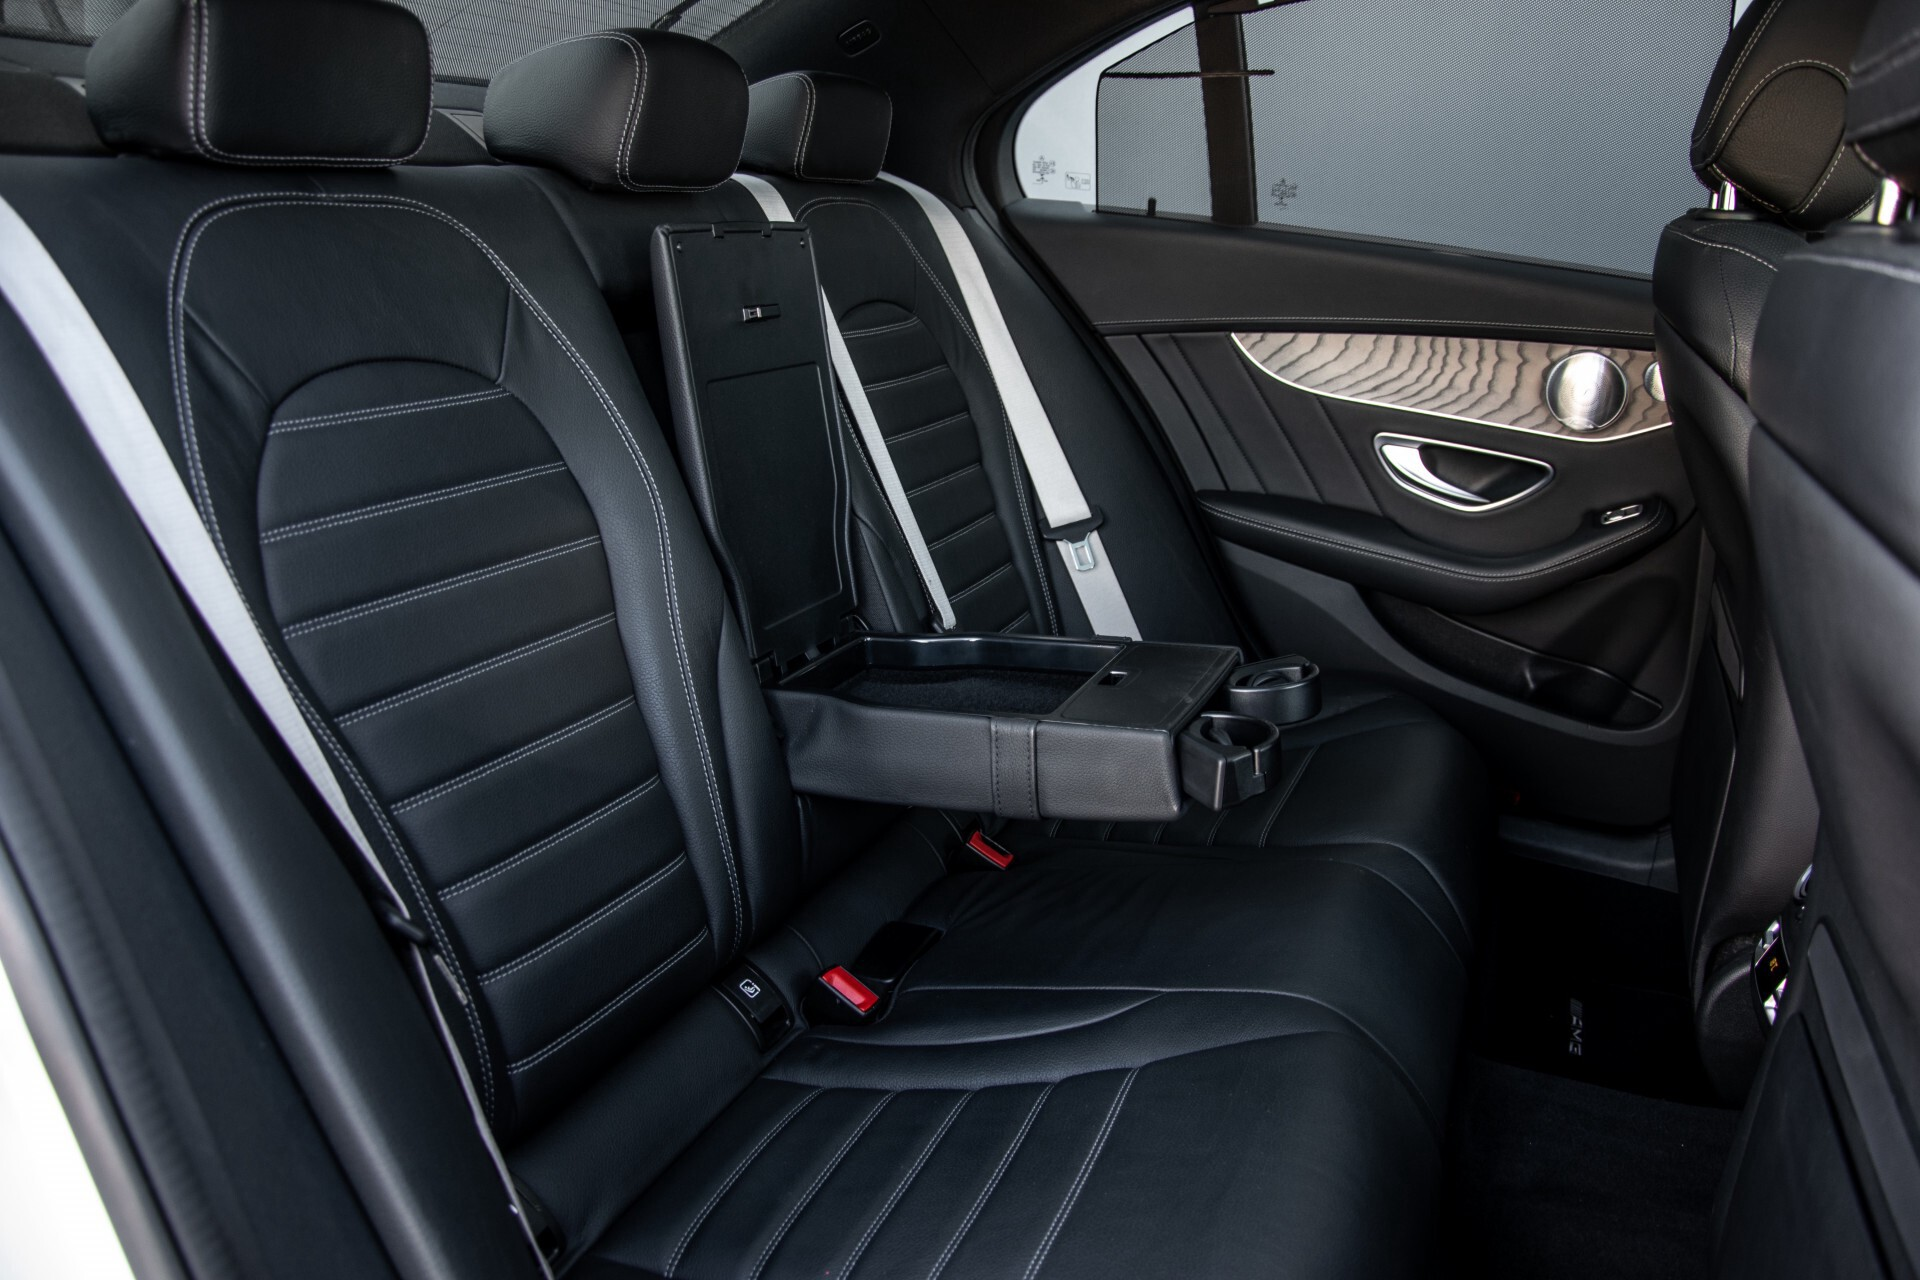 Mercedes-Benz C-Klasse 450/43 AMG 4-M Distronic/Standkachel/Panorama/Keyless/Harman-Kardon/Stoelkoeling Aut7 Foto 5